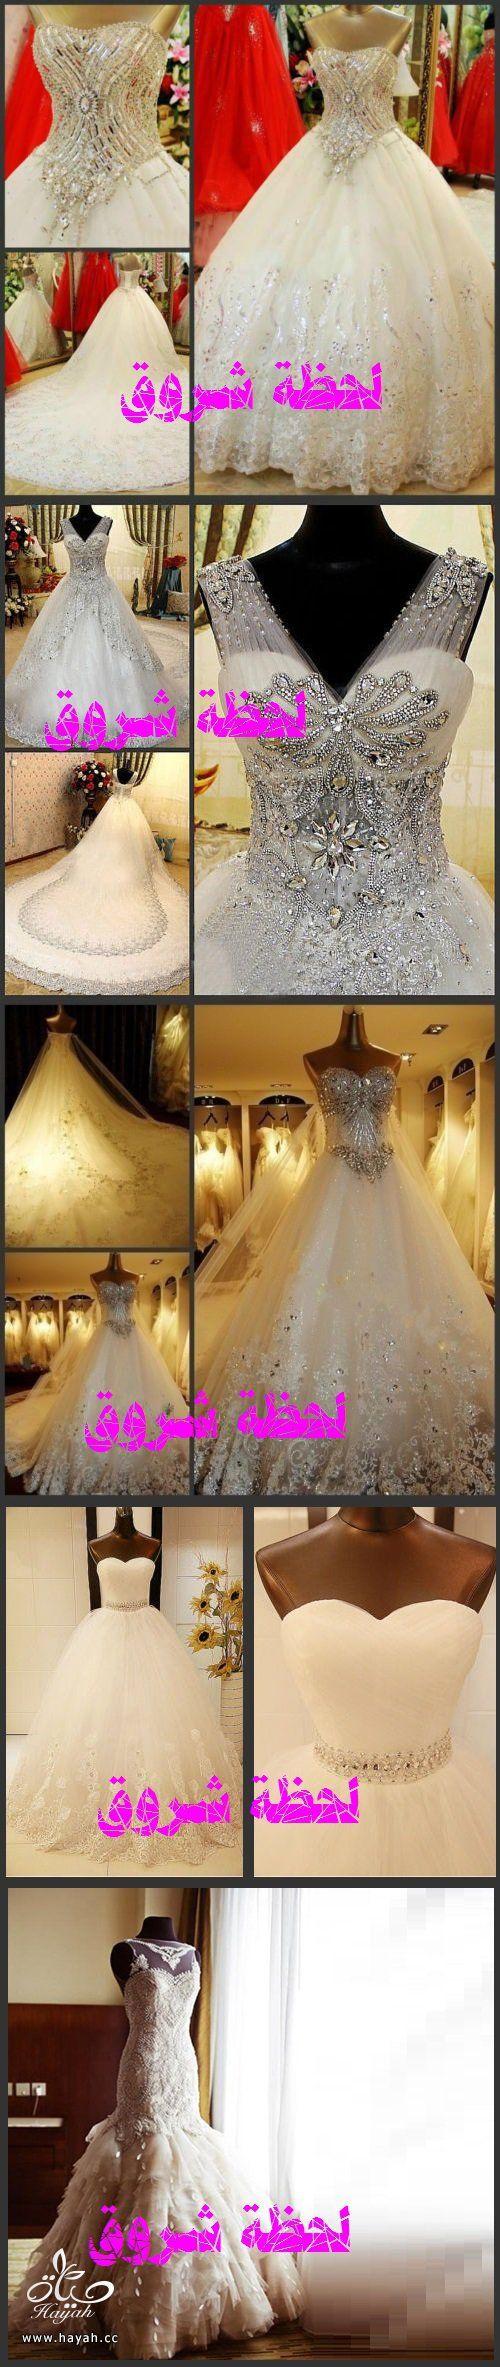 فساتين زفاف hayahcc_1474729761_559.jpg